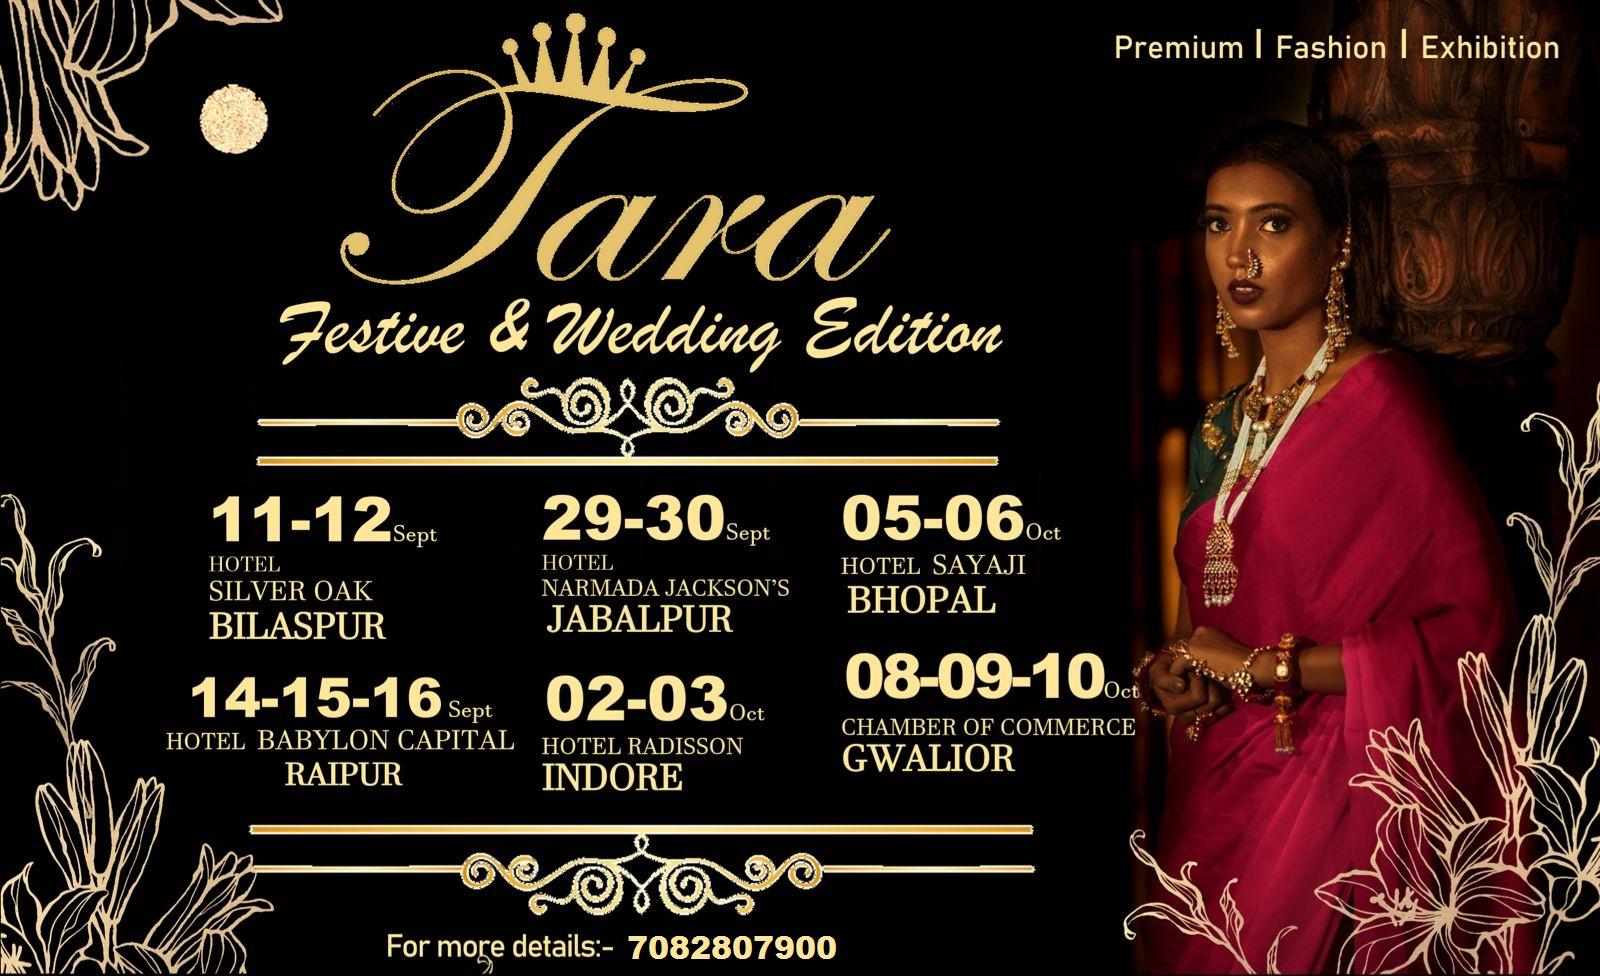 Festive & Wedding Edition Exhibition